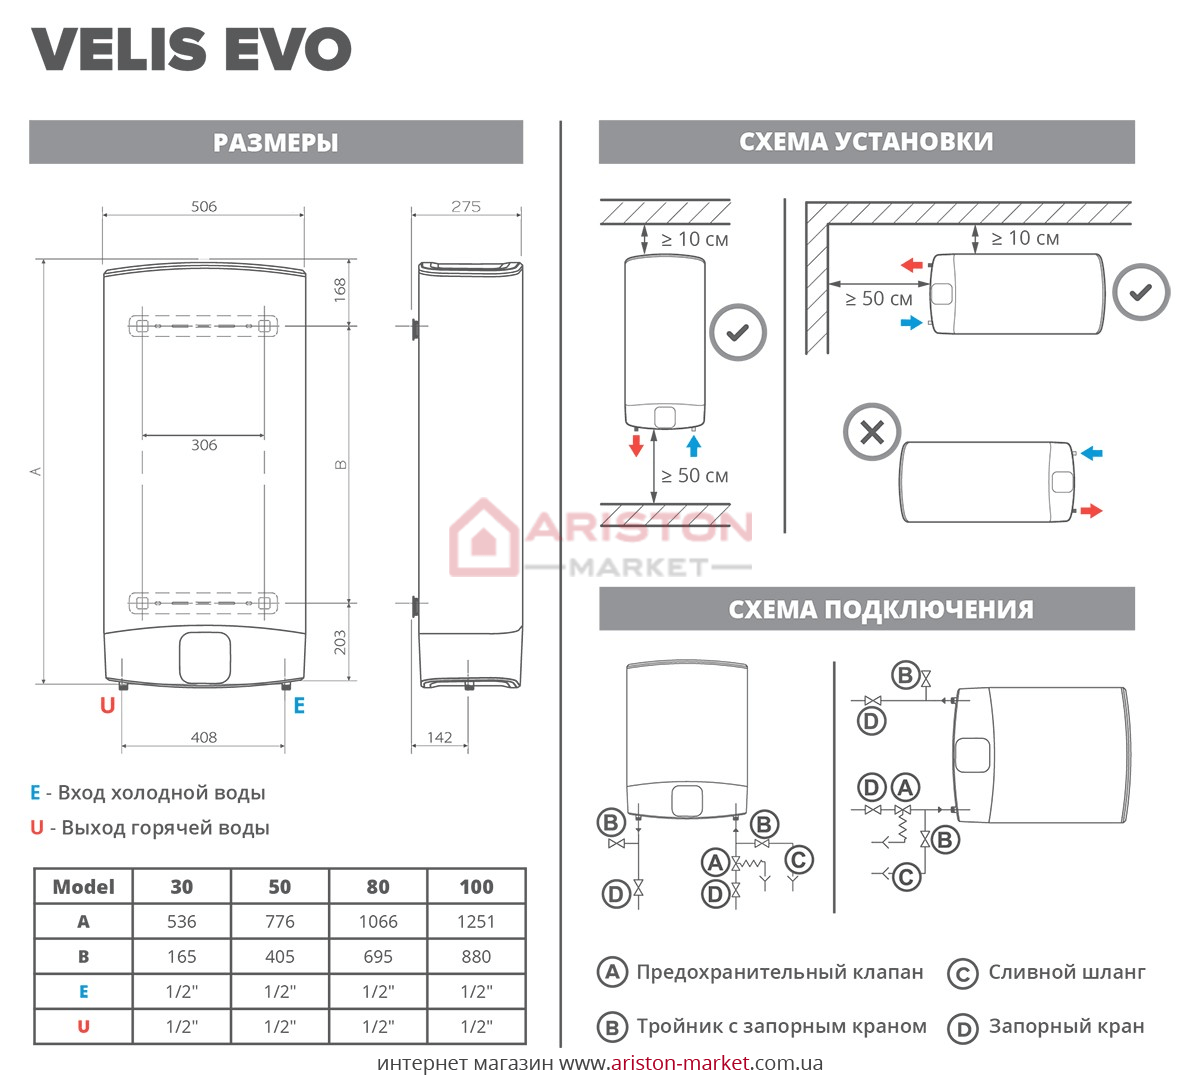 Ariston ABS Velis Evo Power 100 схема, габариты, чертеж